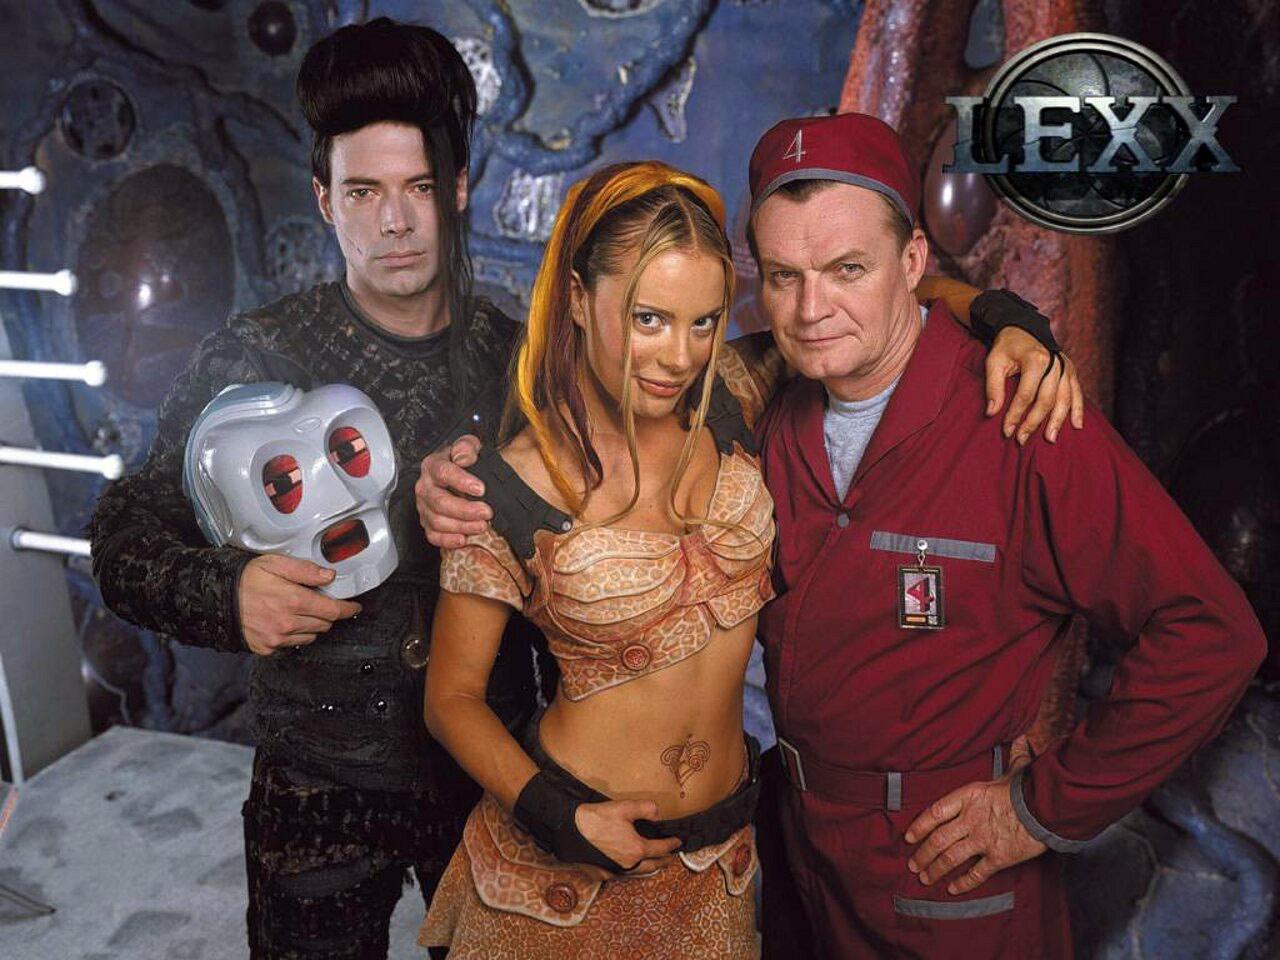 Lexx - The Dark Zone - Costume Design